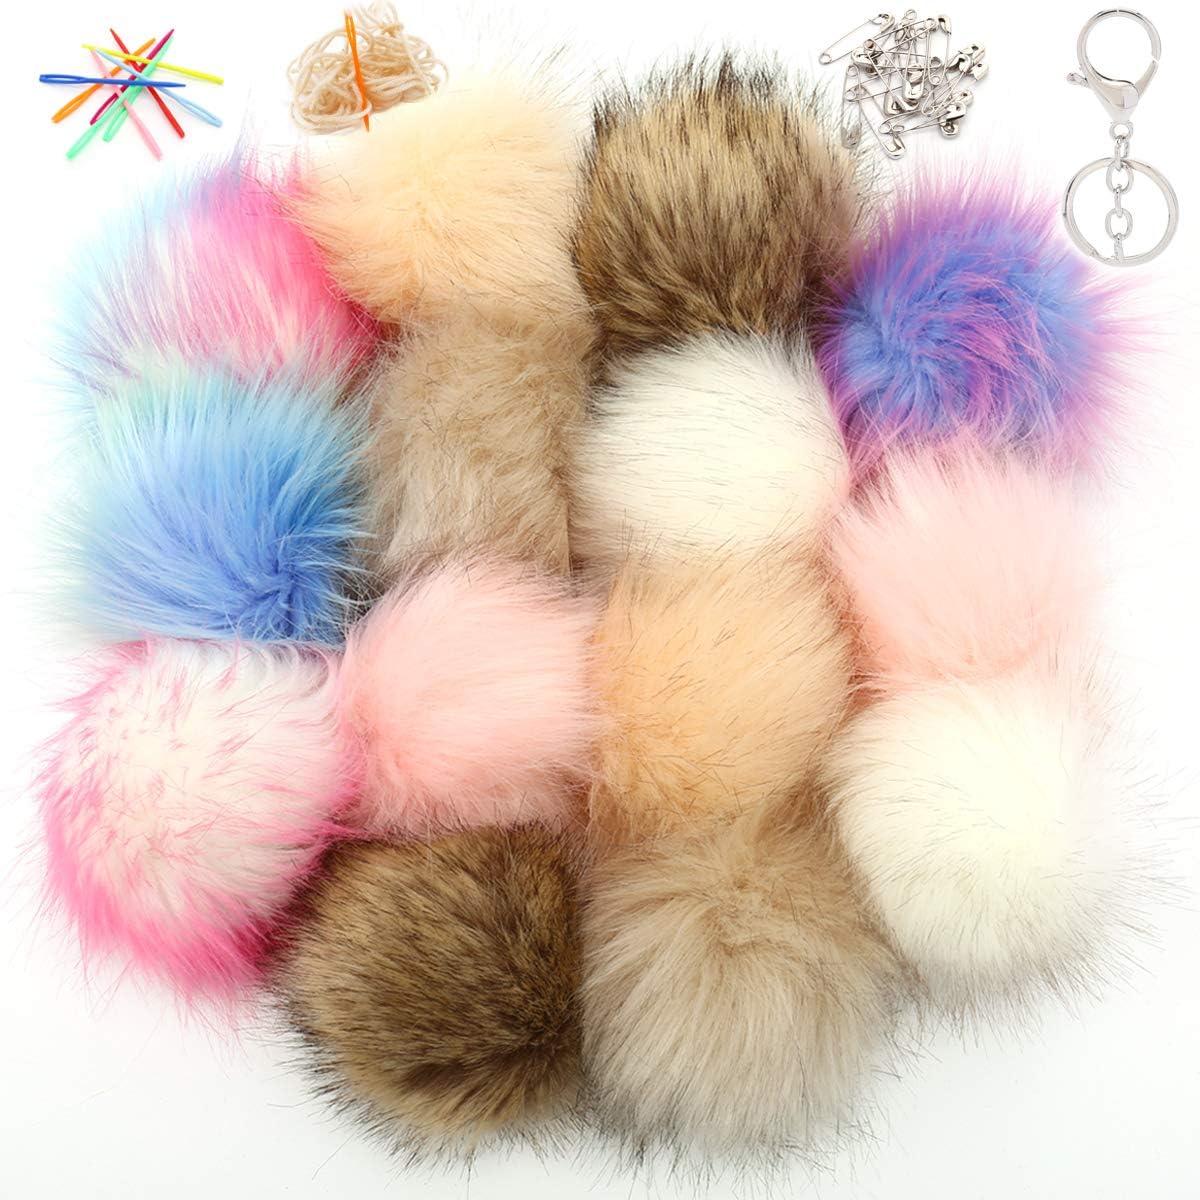 14 Pieces Faux Fox Fur Pom Poms Ball for Hats Scarves Shoes Bag Key Chain DIY Charms Ornament